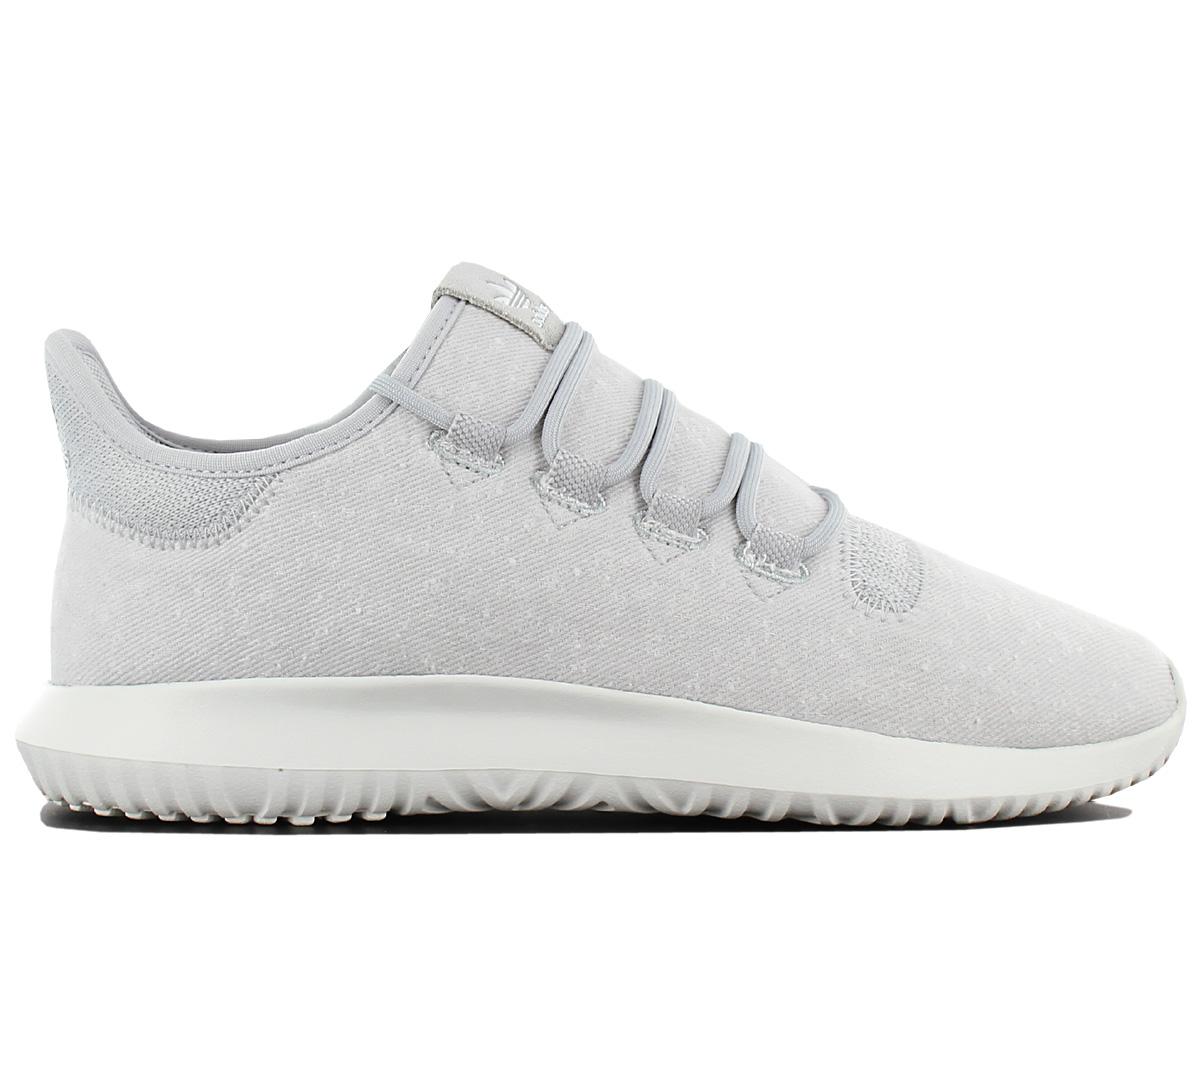 Détails sur Adidas Originals Tubulaire Shadow Baskets Chaussures Homme Gris BY3570 Neuf